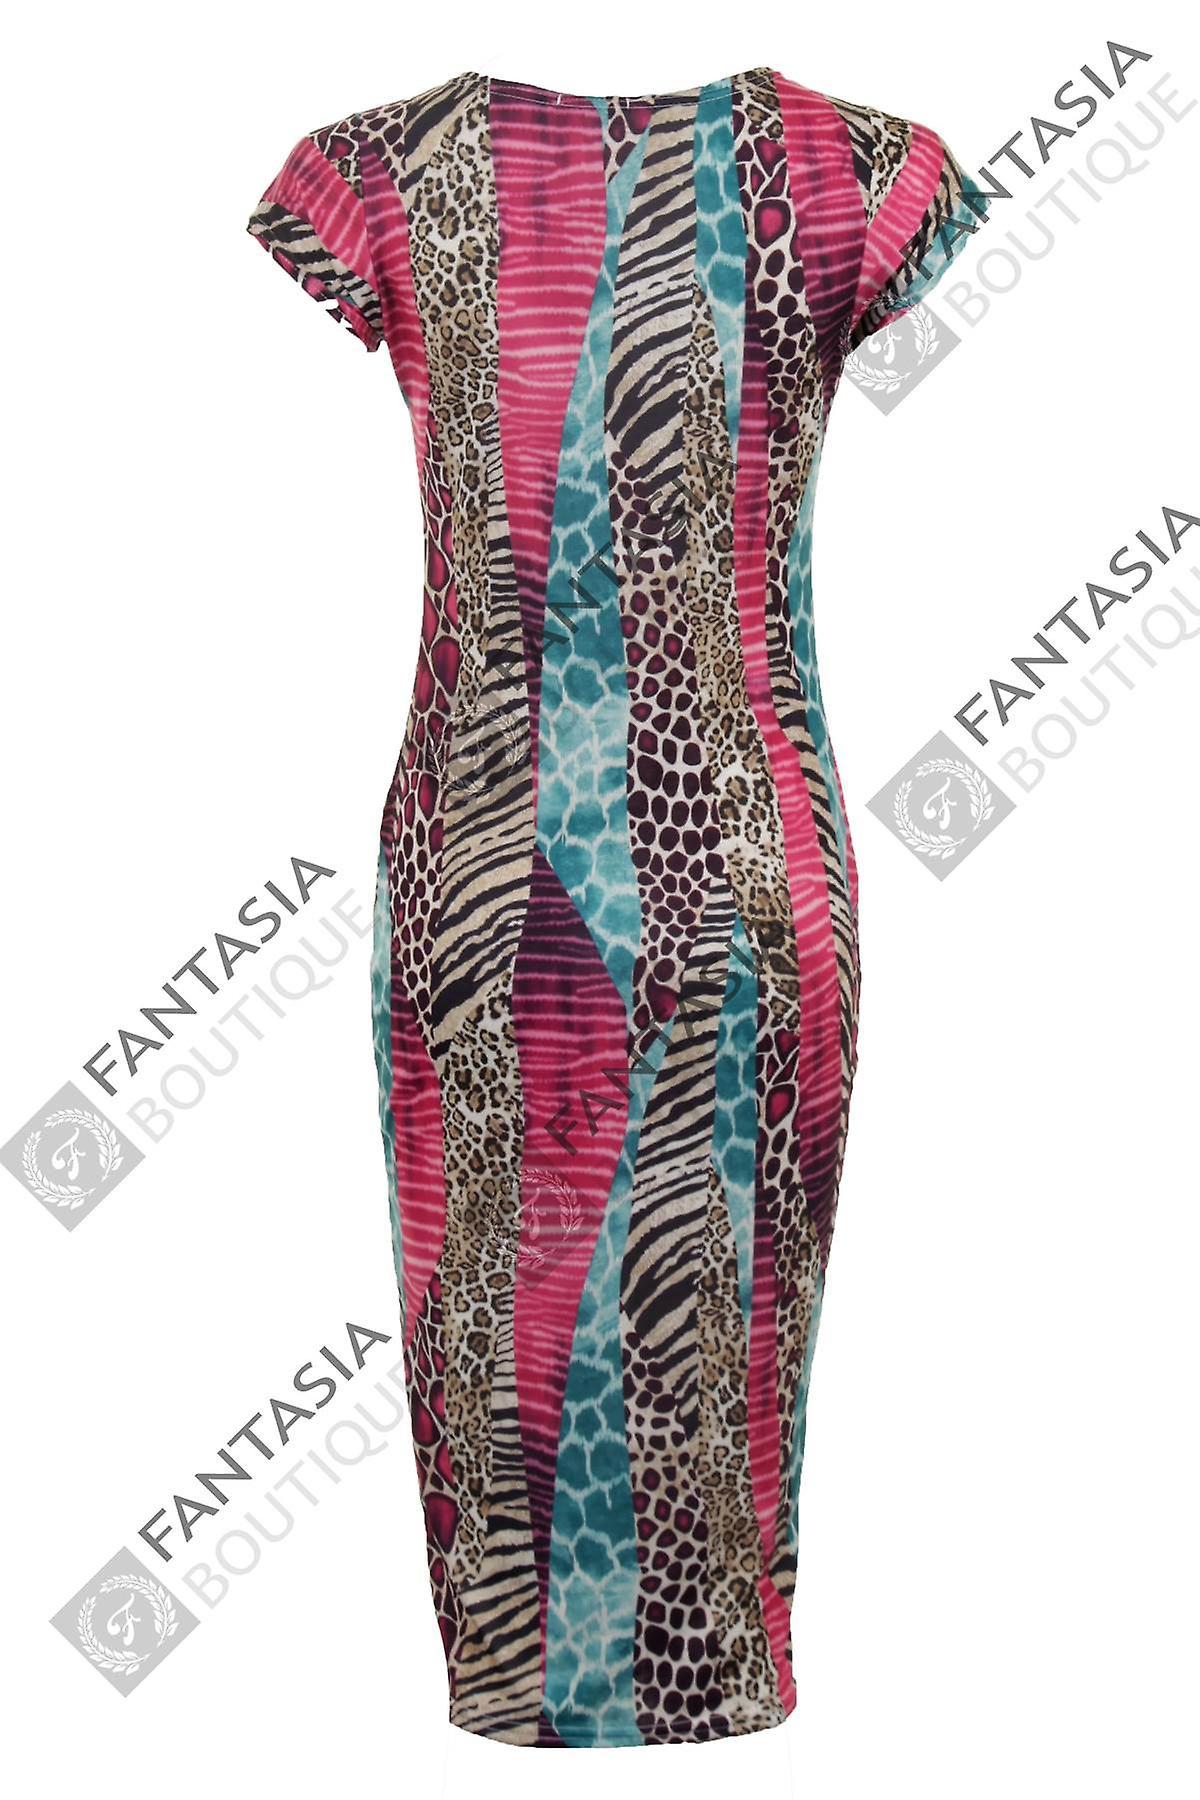 New Ladies Cap Sleeve Tribal Snake Print Midi Women's Bodycon Dress